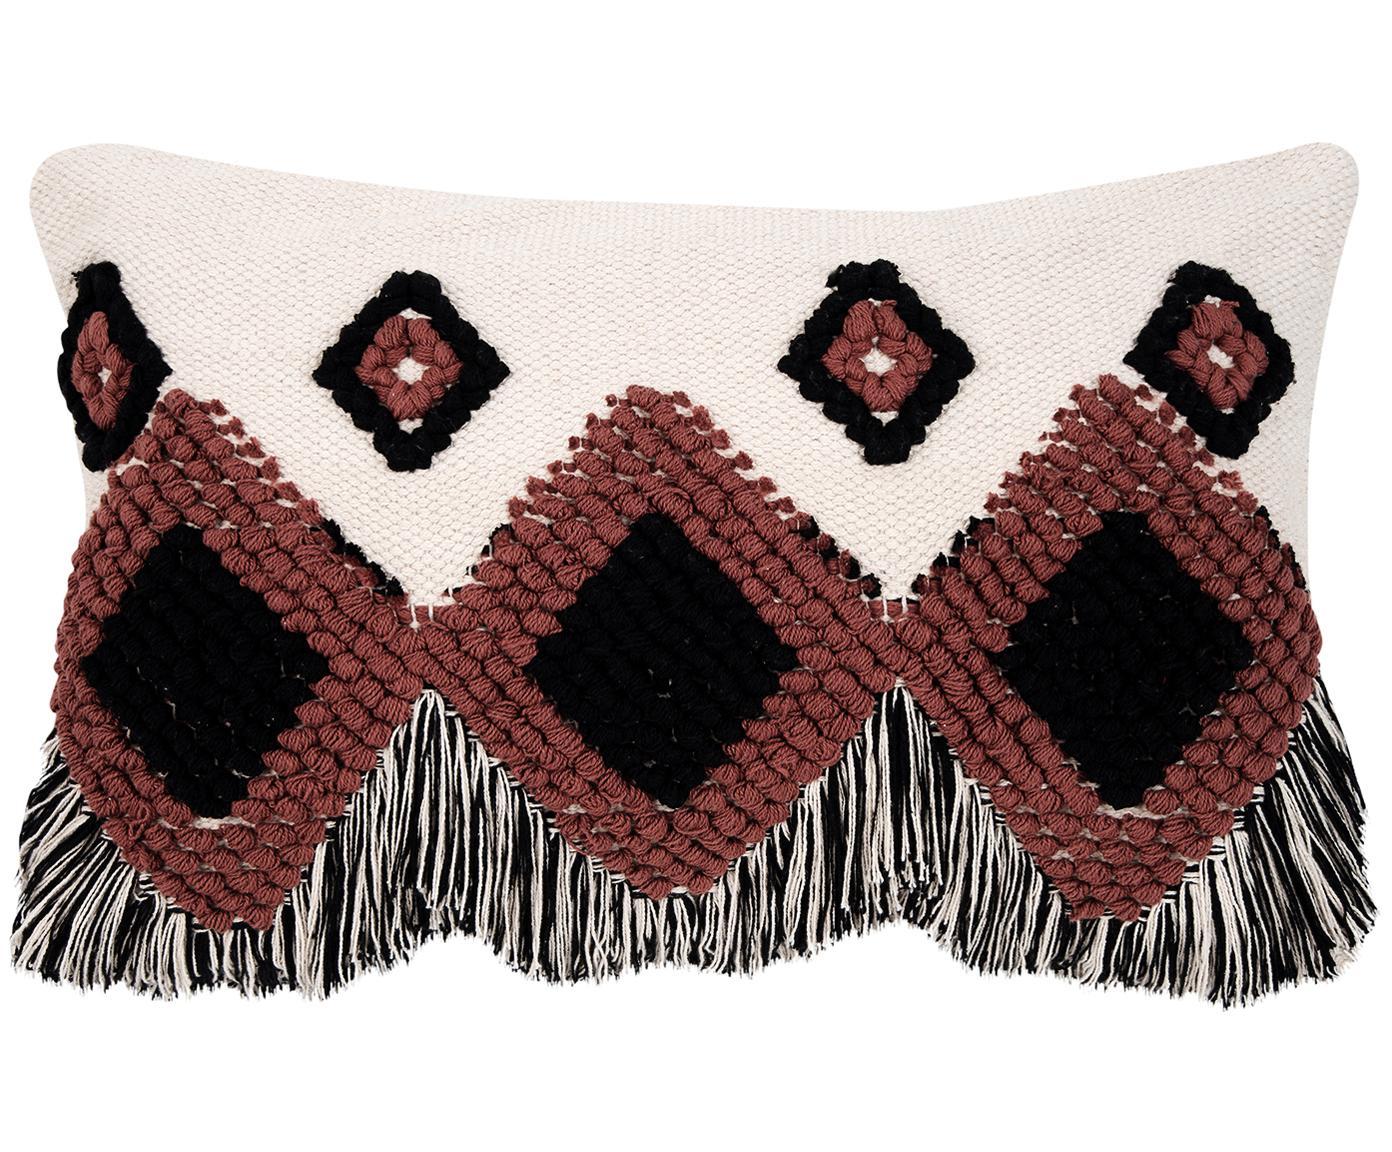 Funda de cojín Tanea, estilo étnico, Algodón, Crudo, negro, rojo cobrizo, An 40 x L 60 cm